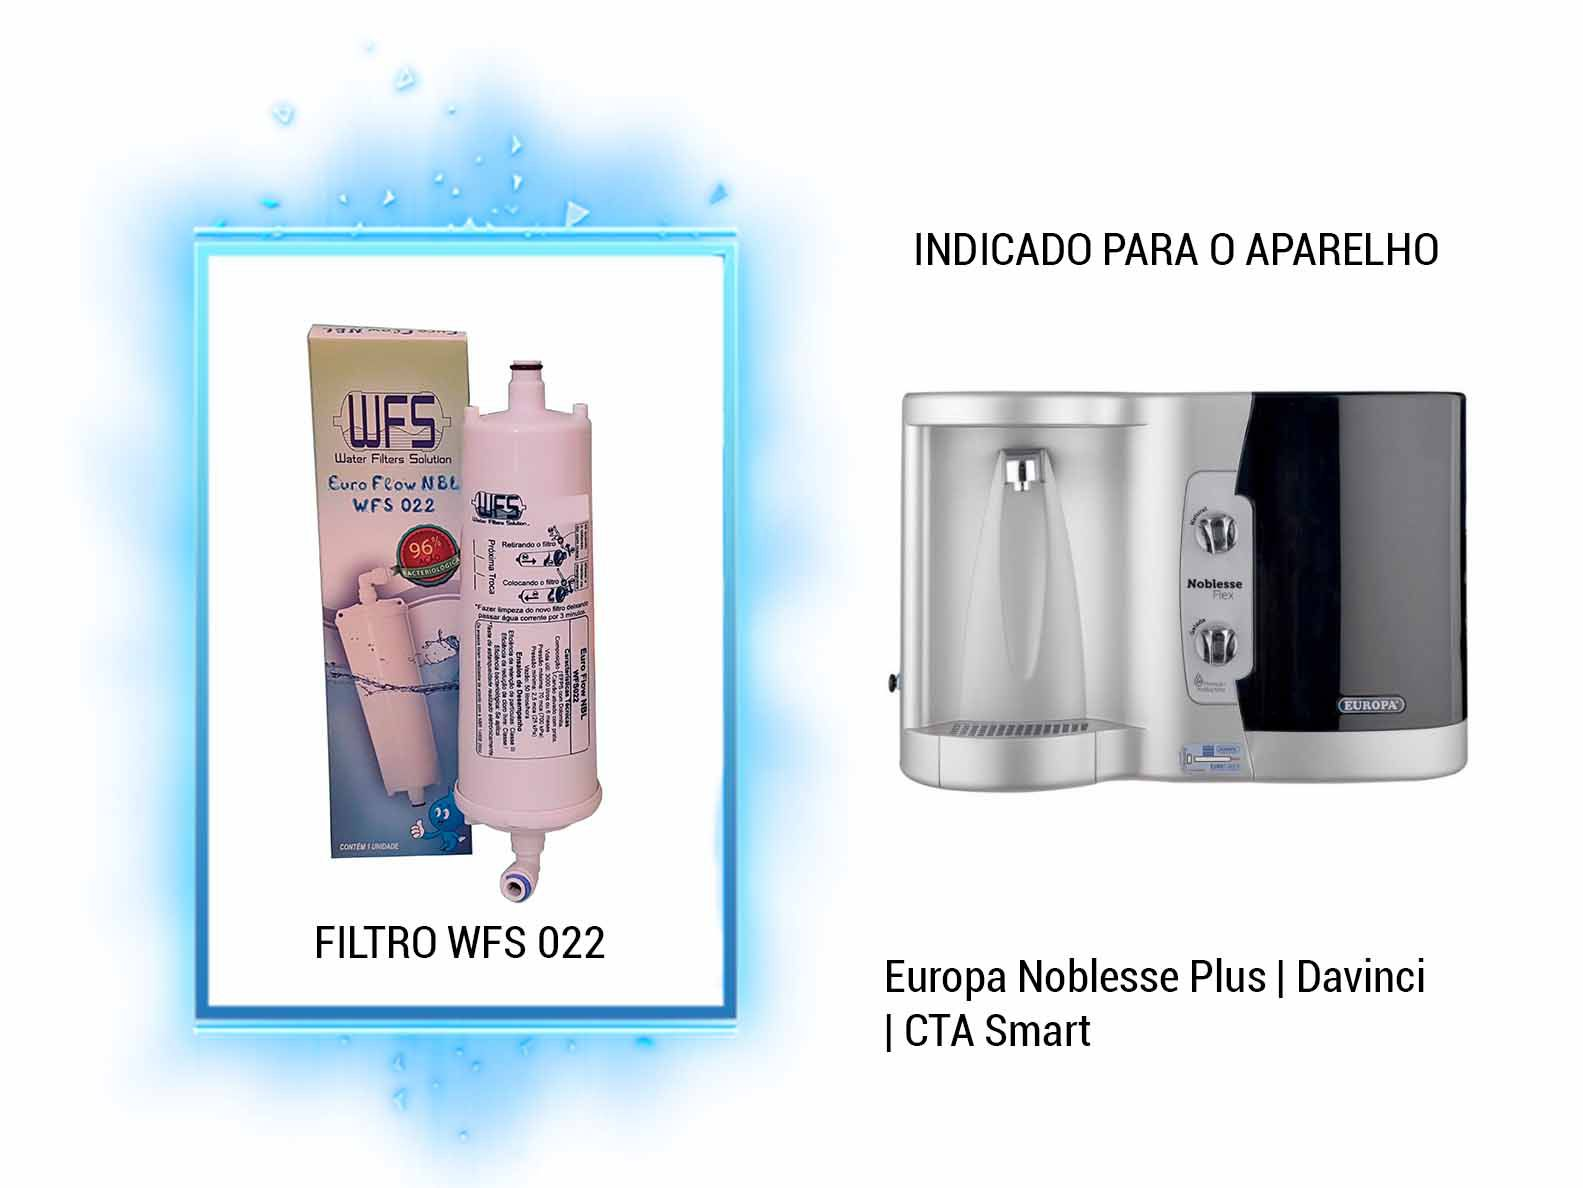 Refil Purificador Europa Noblesse| Wfs 022 | EuroFlow NBL